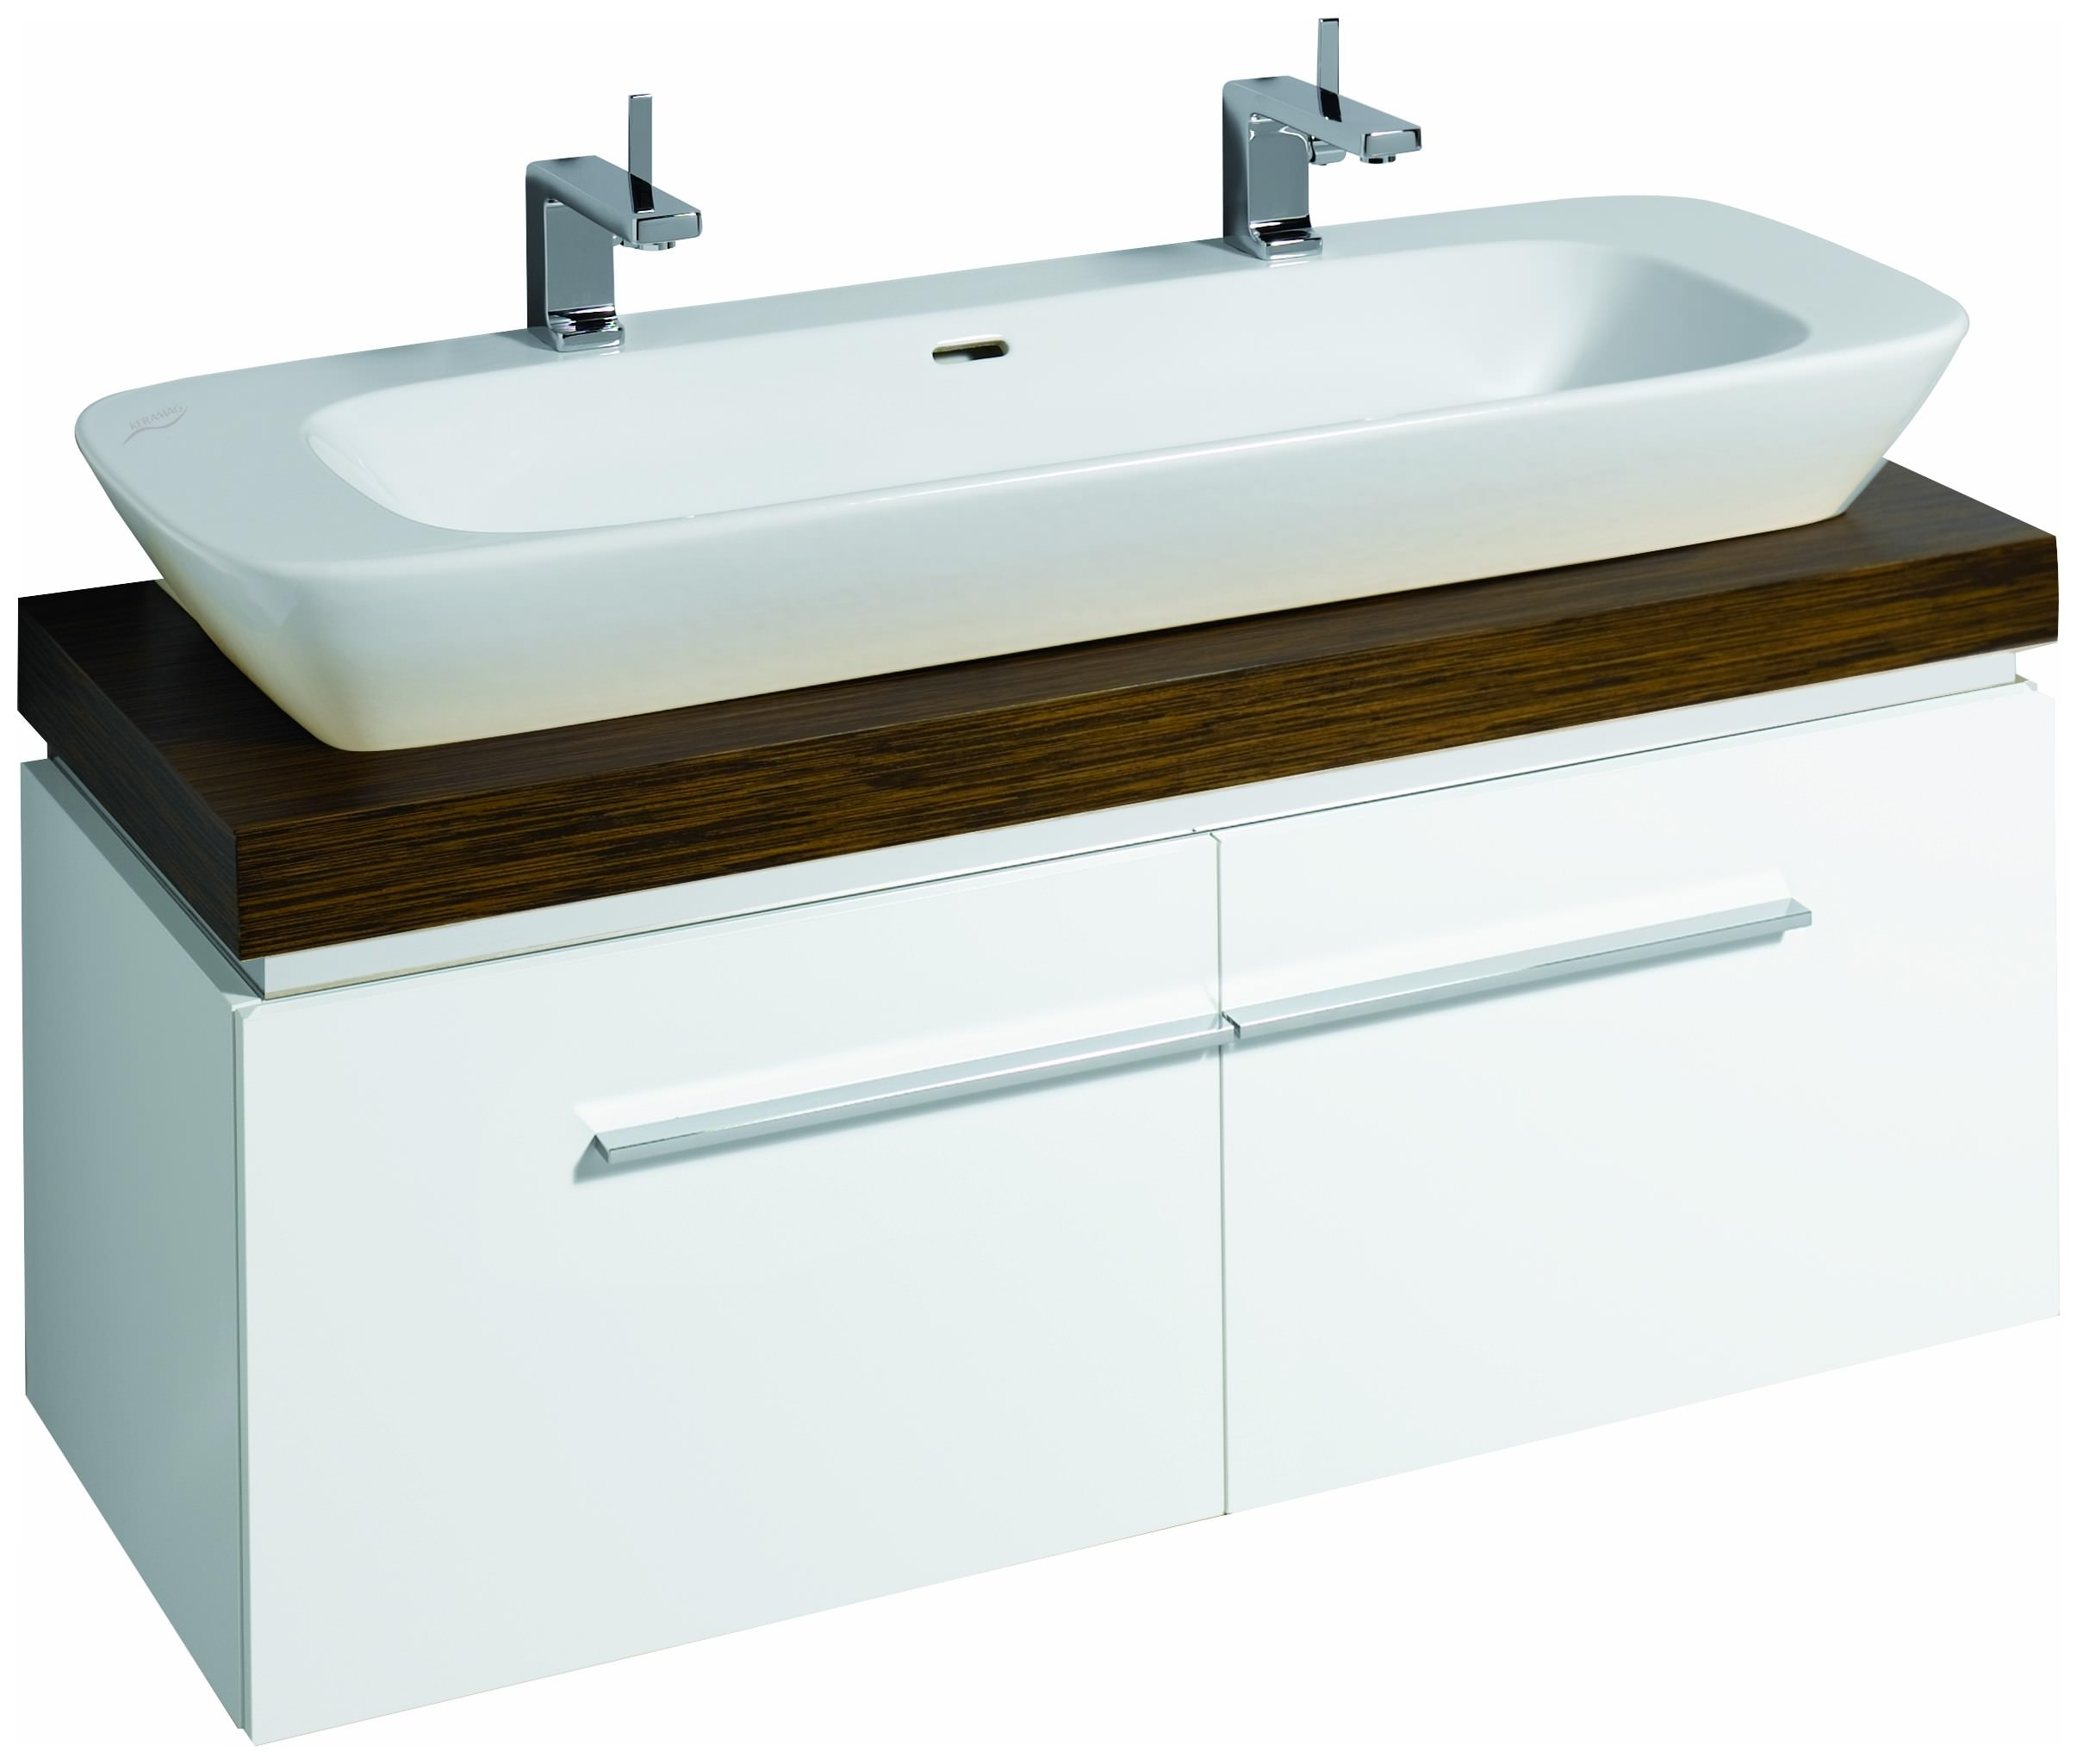 keramag silk waschtisch 121620 1200mm x 470mm wei alpin. Black Bedroom Furniture Sets. Home Design Ideas